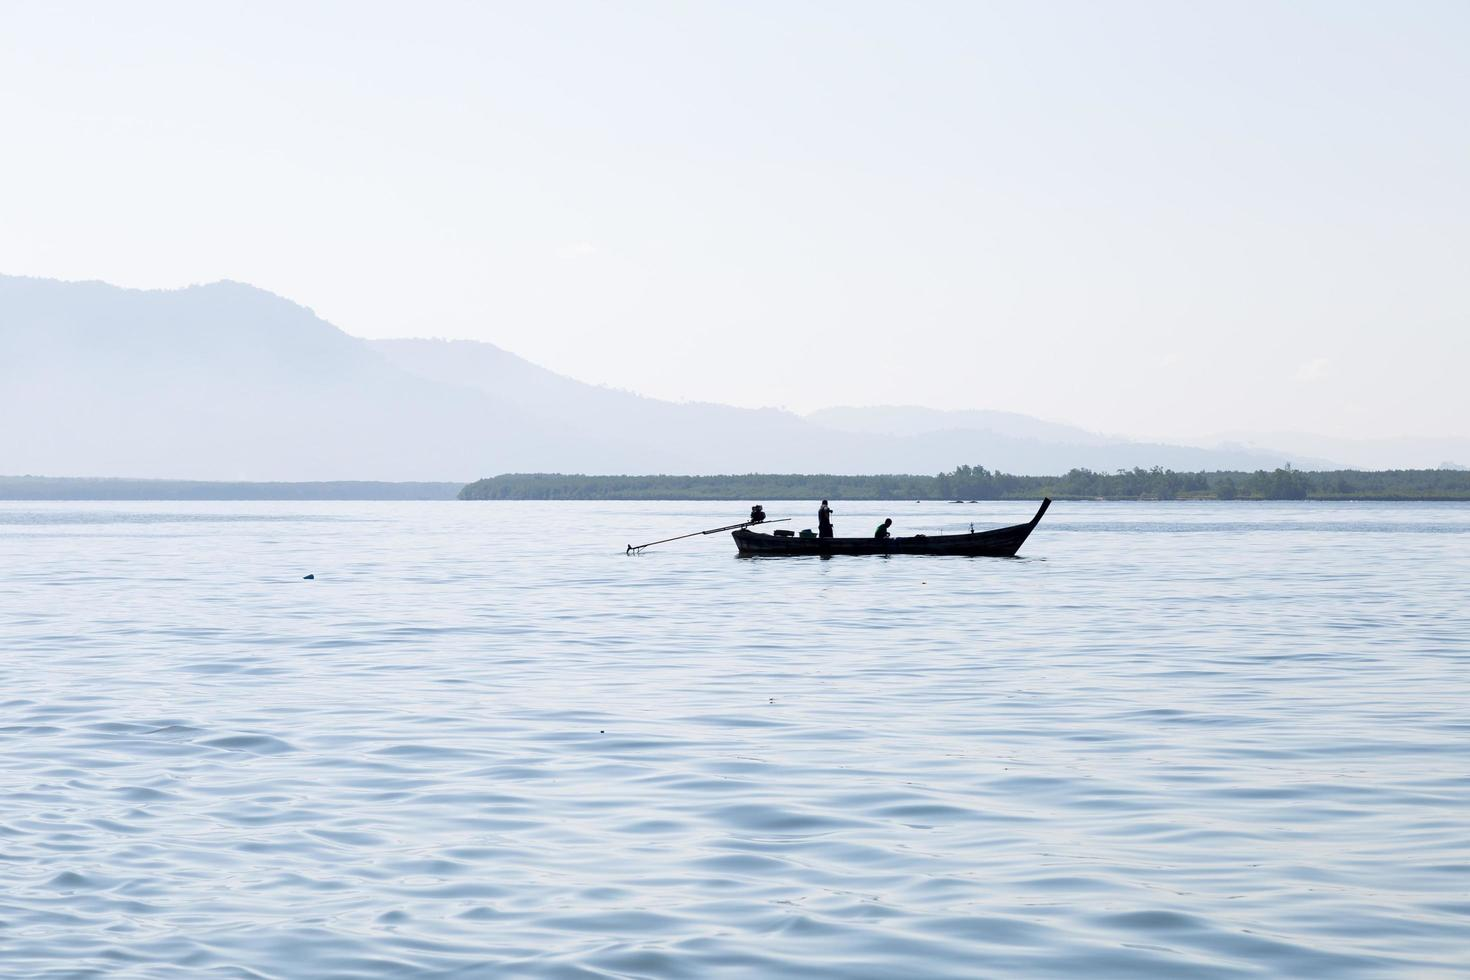 silueta de un barco de pesca foto